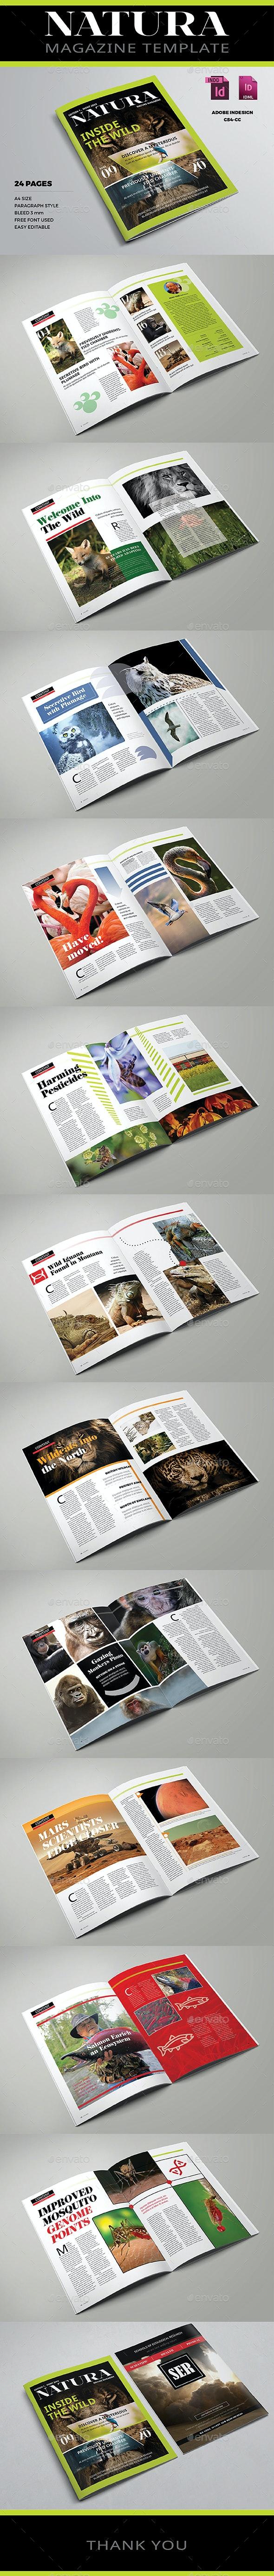 Natura Magazine Template - Magazines Print Templates